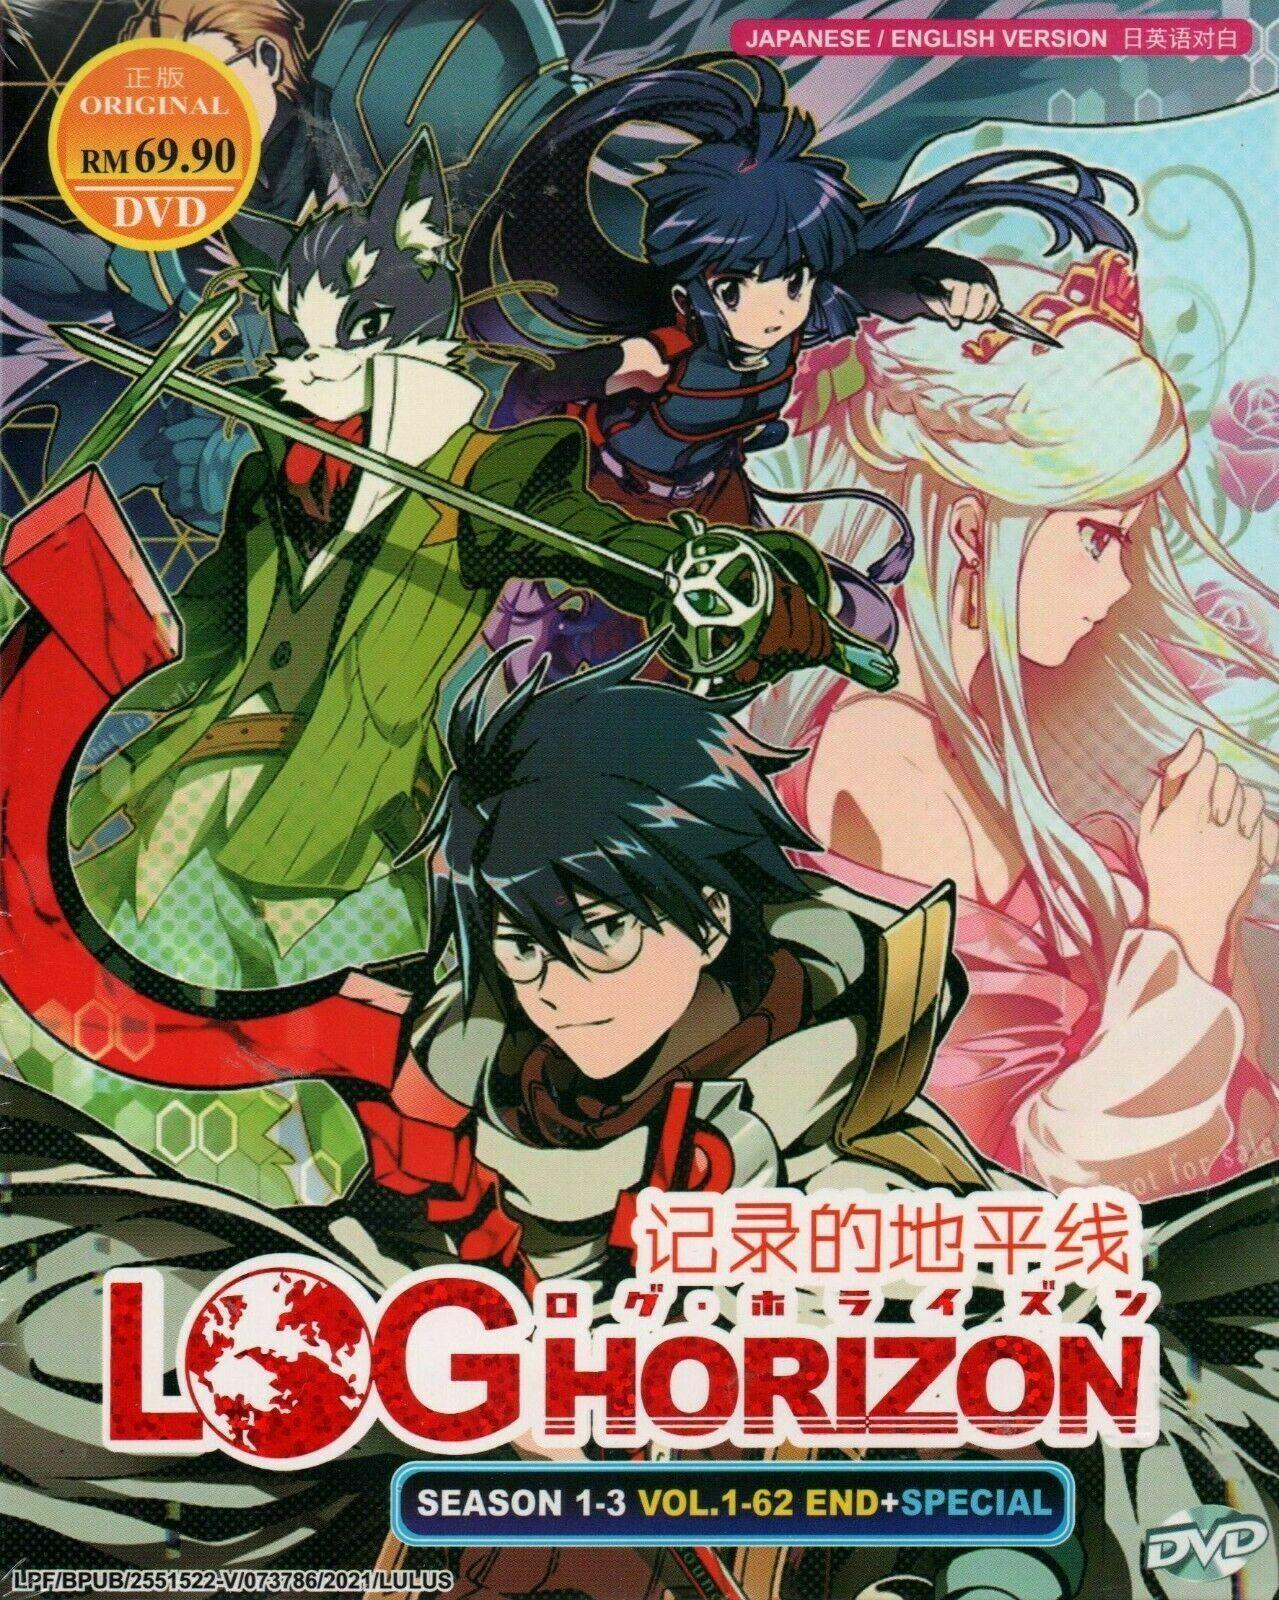 Log Horizon Season 1-3 Vol.1-62 End + Special English Dubbed Ship From USA DVD